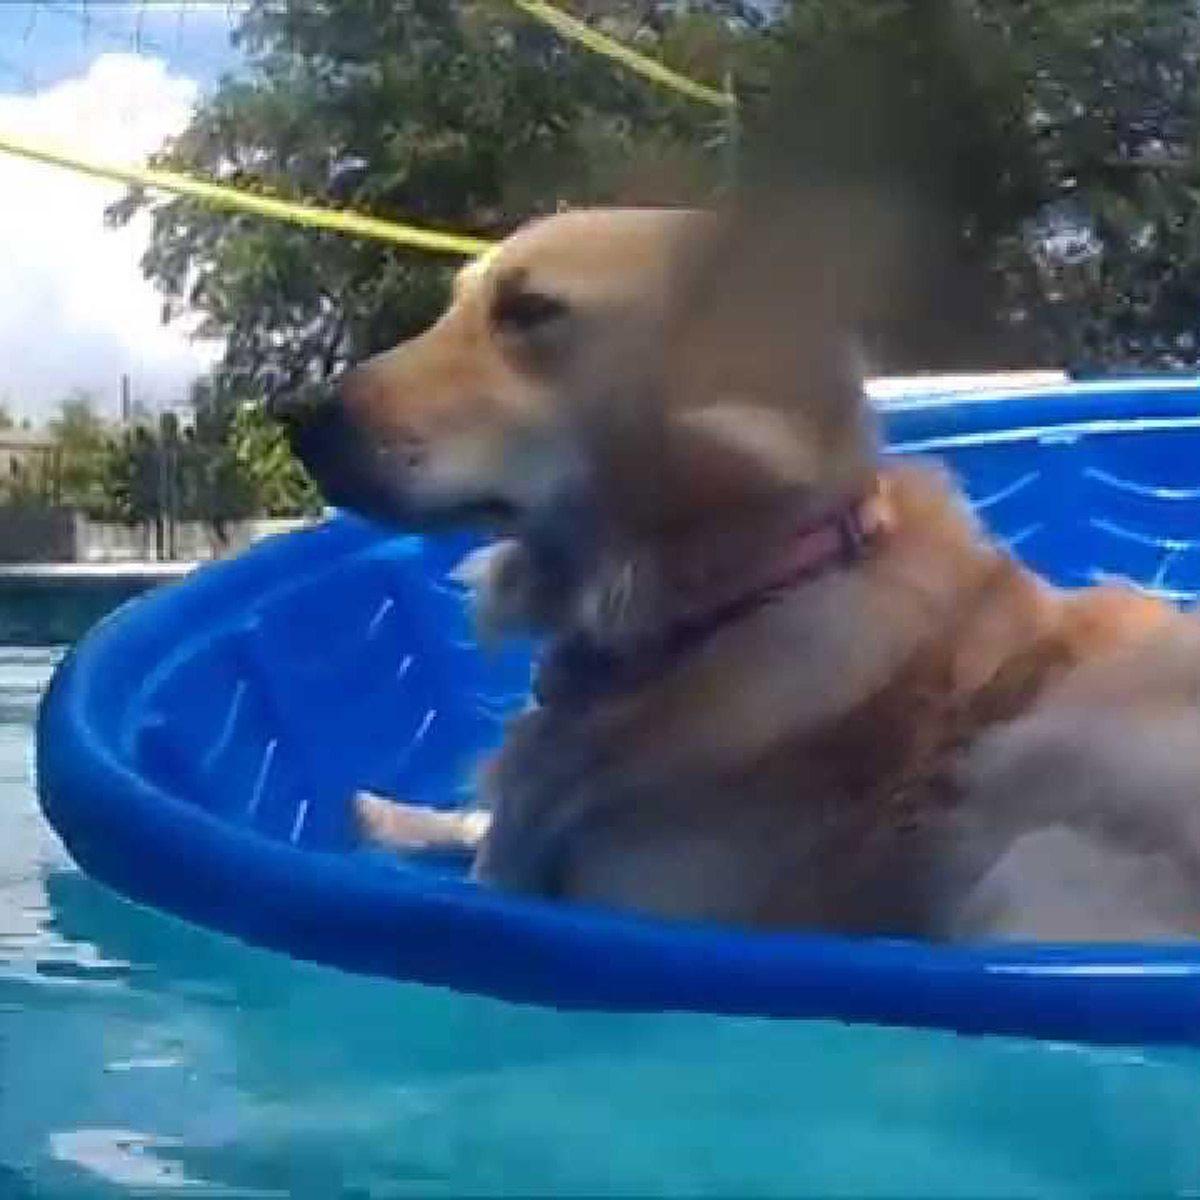 5 DIY Pool Floaties Your Dog Will Love | Family Handyman